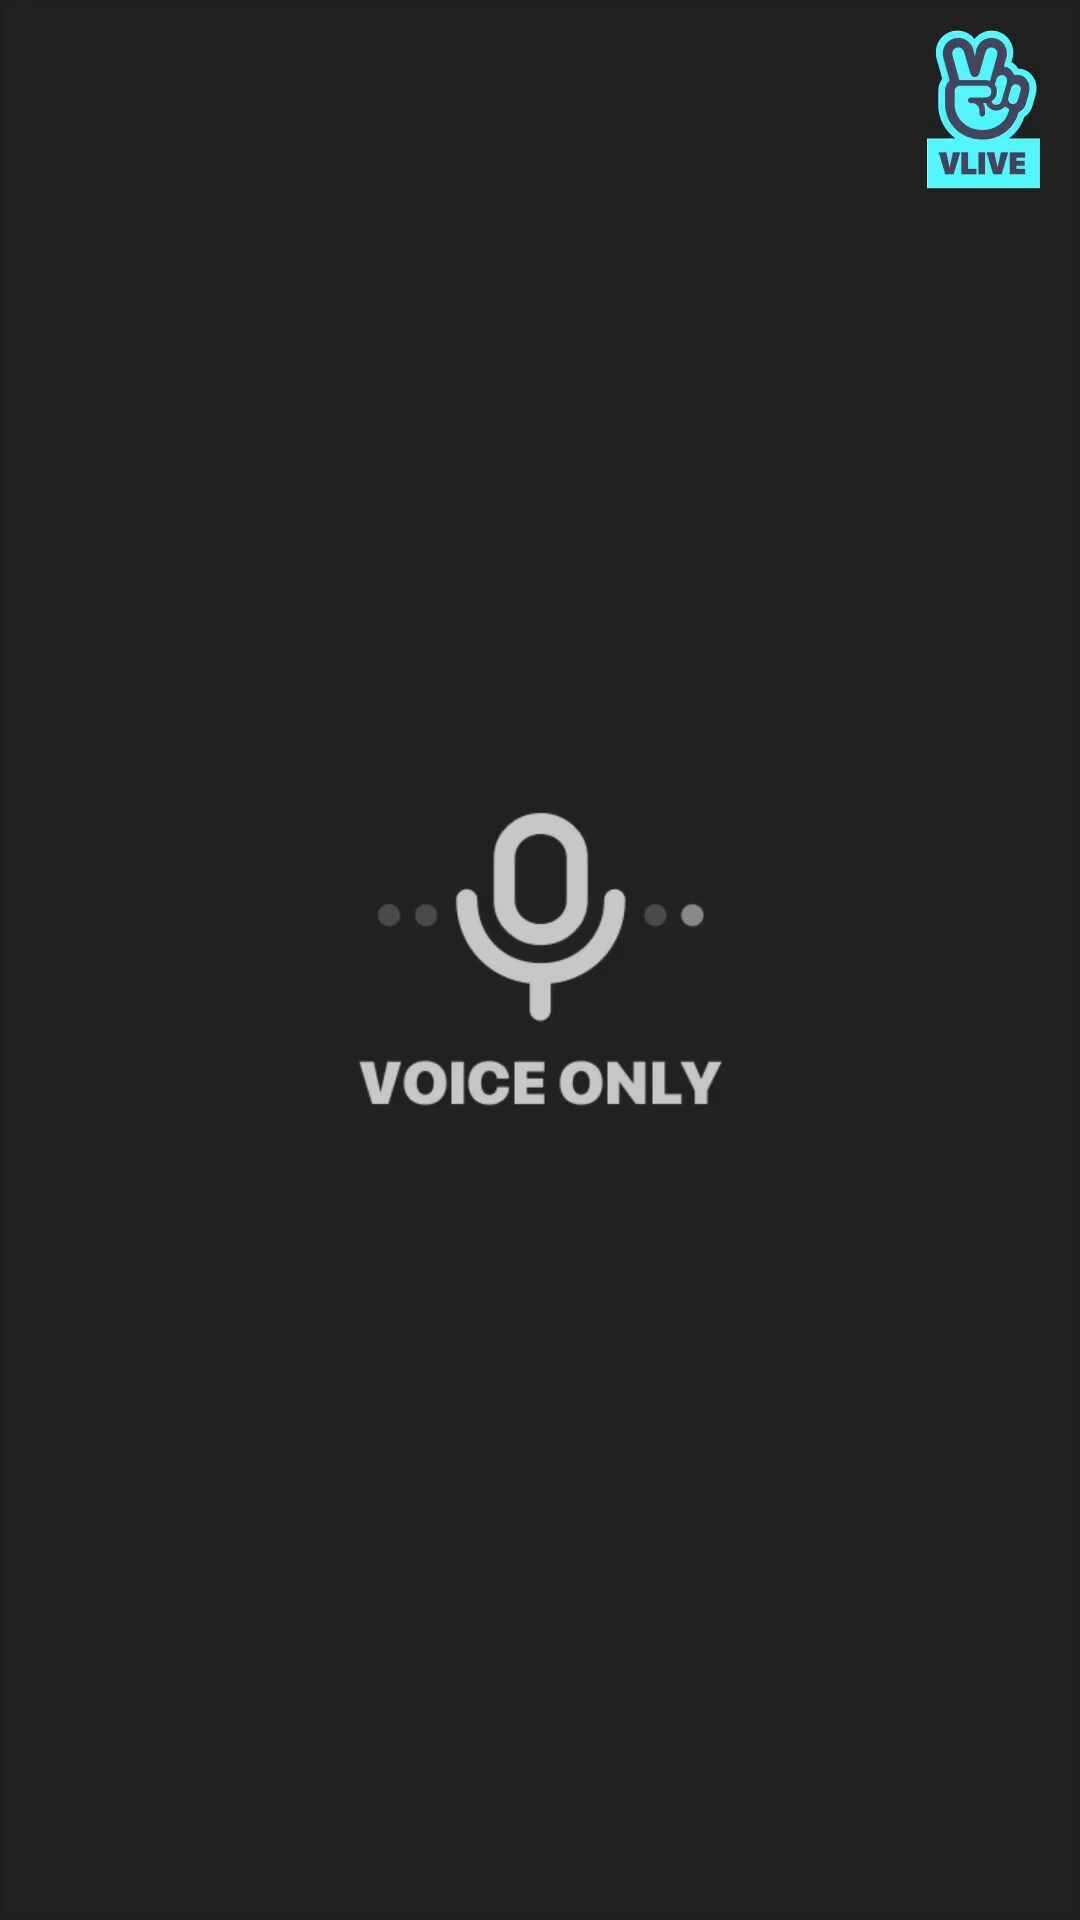 [RADIO] 캐럿들 귀대귀대 #87DIN😎